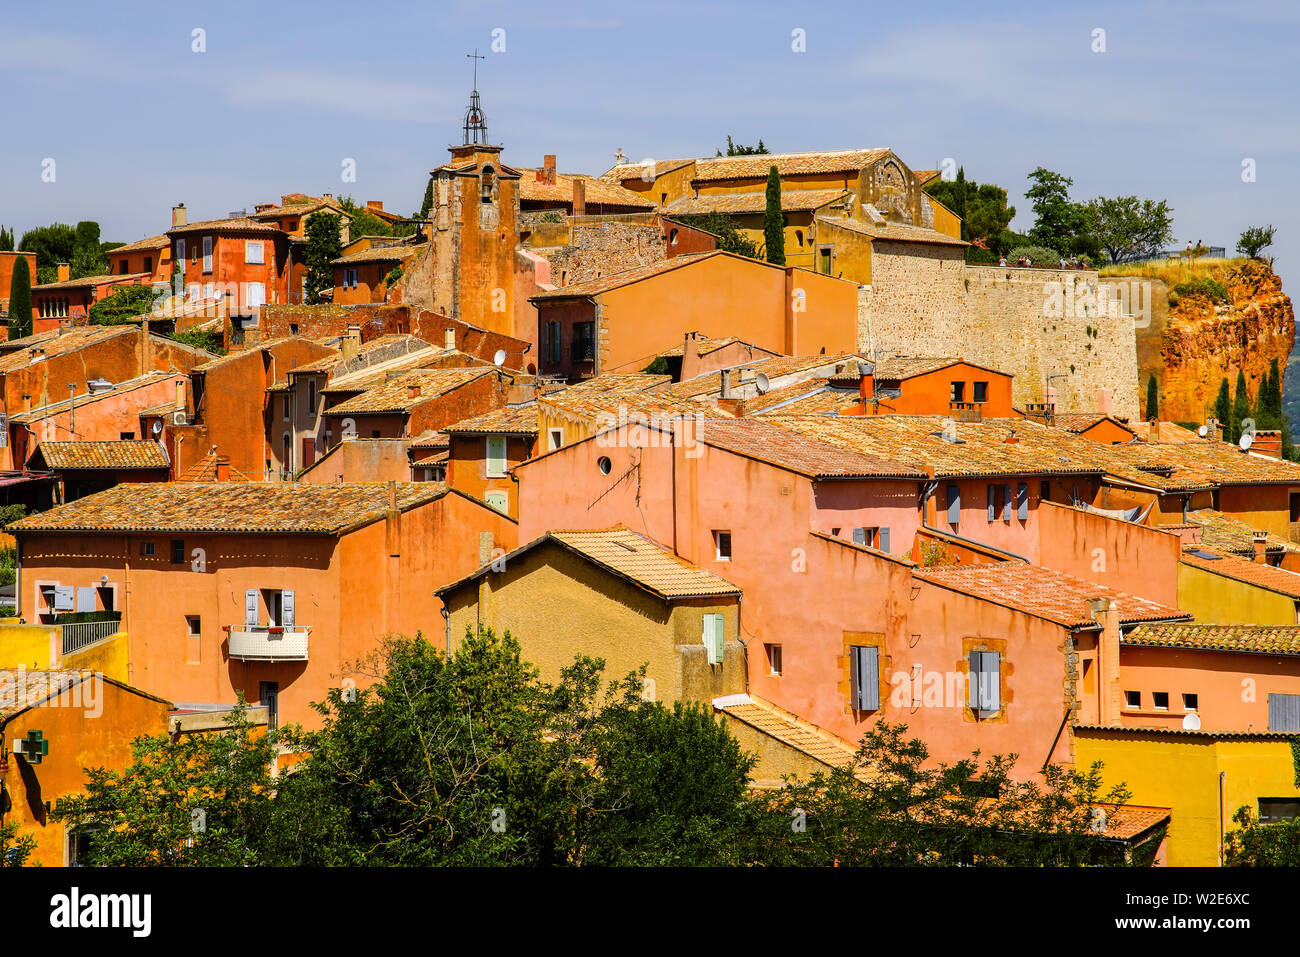 Pintoresco pueblo de Roussillon, Vaucluse, Provenza, Francia. Imagen De Stock